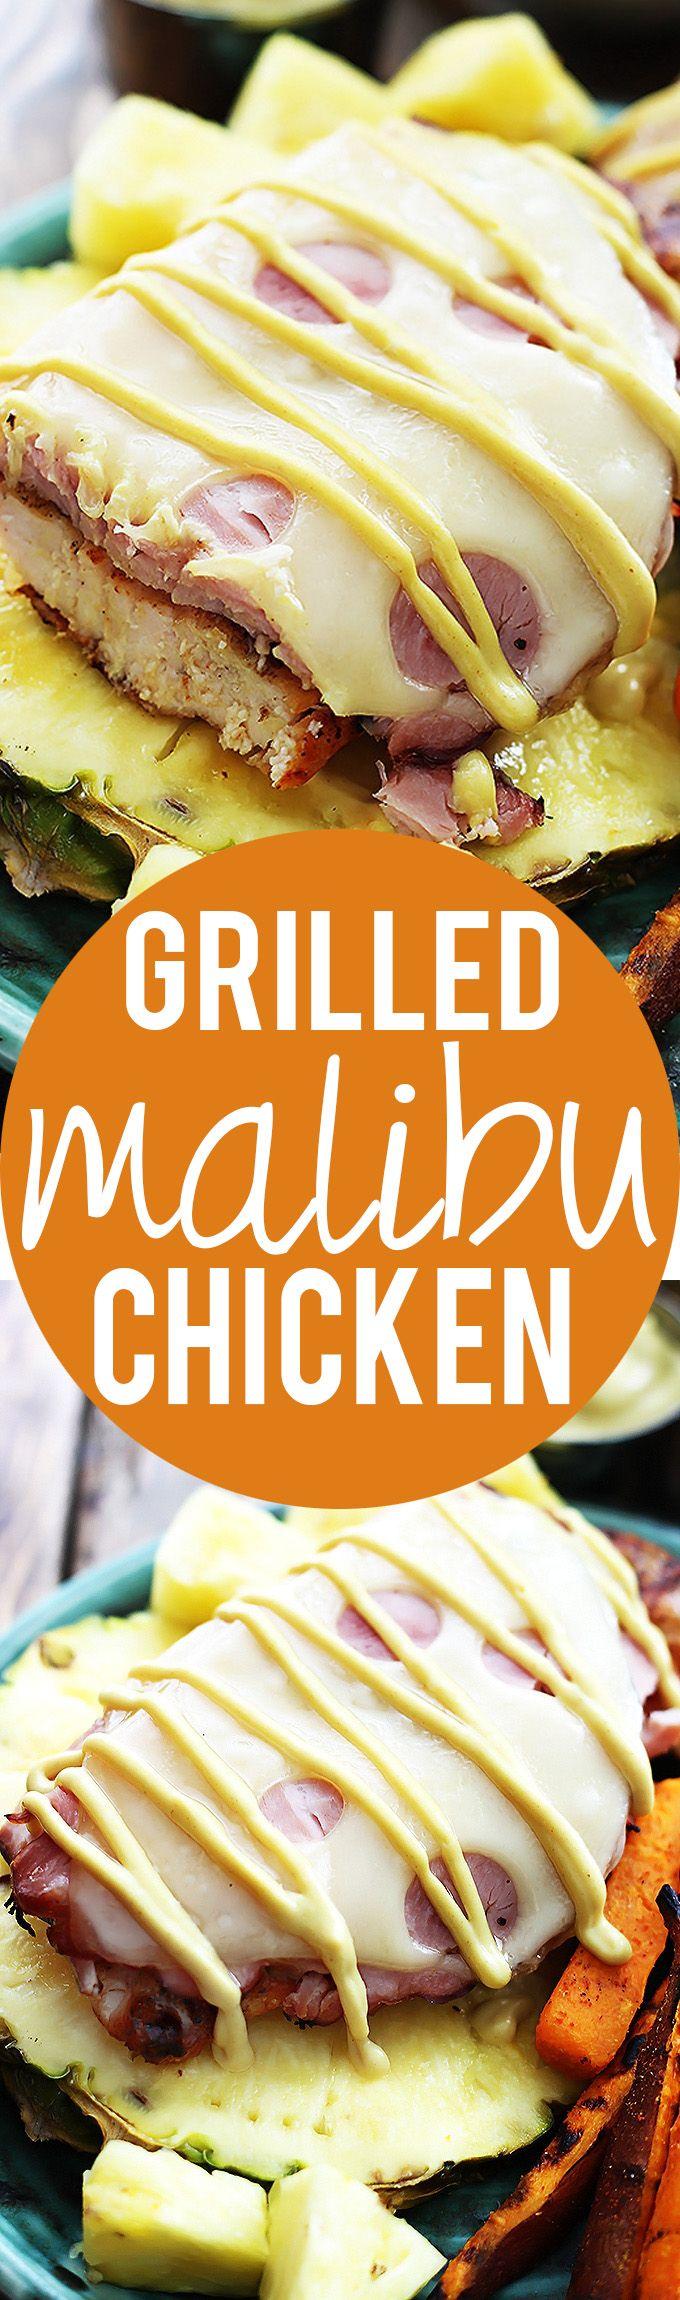 Malibu rum chicken recipes